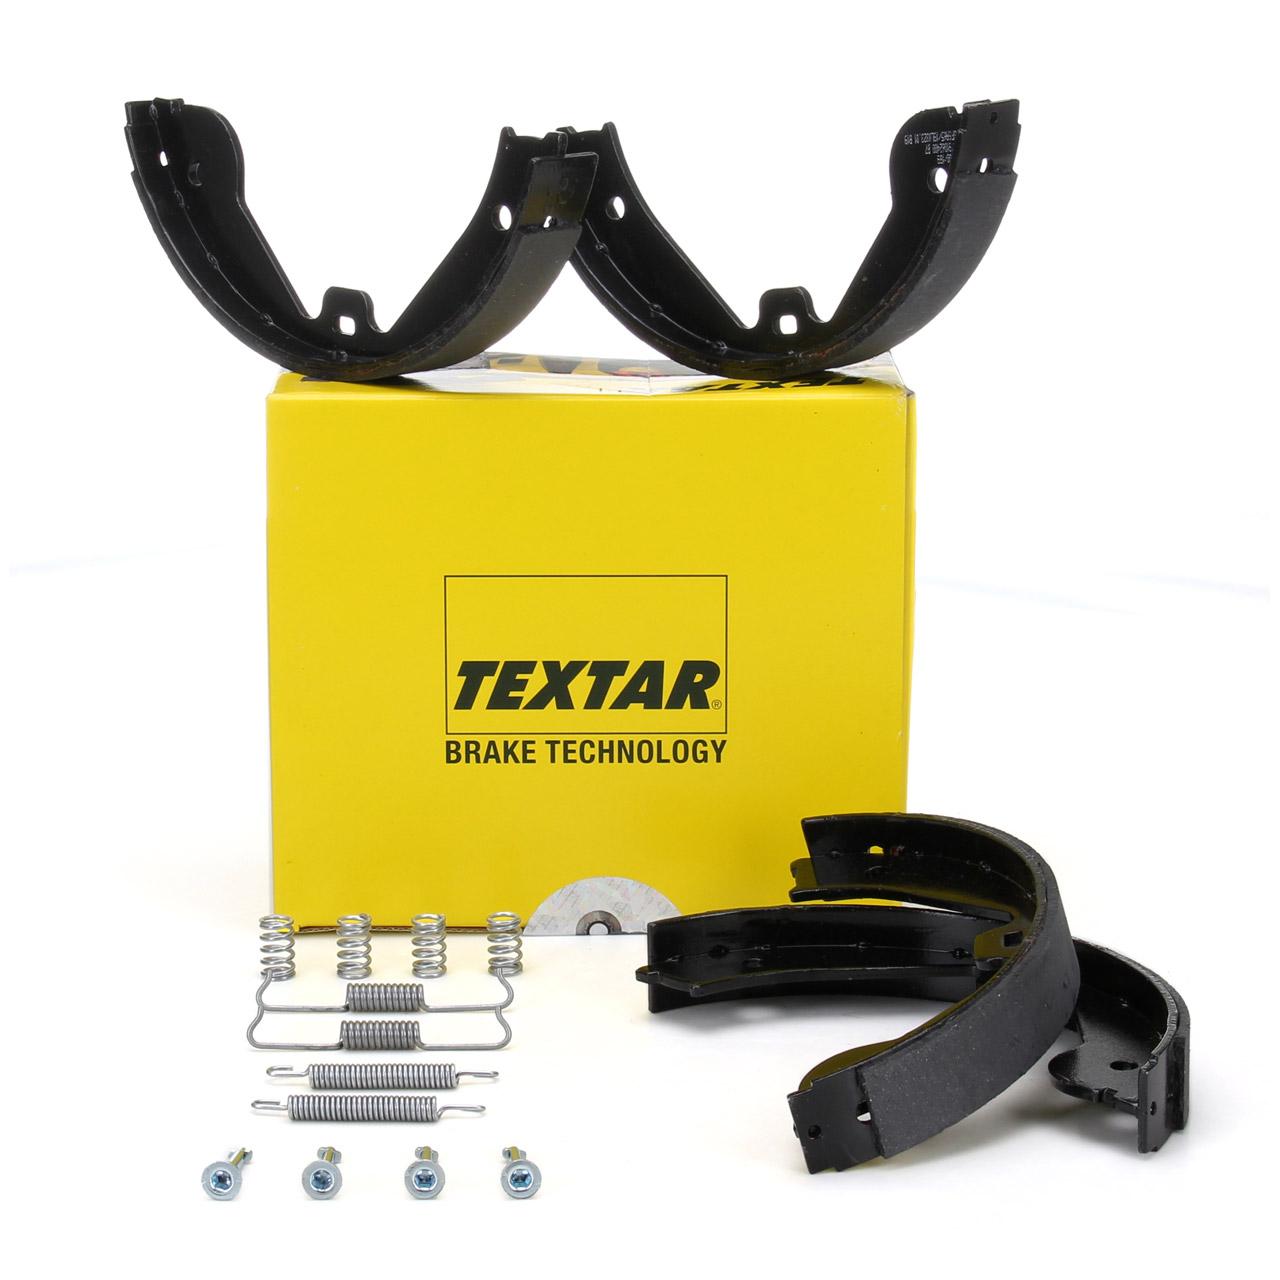 TEXTAR 91062400 Bremsbacken + Federn Satz AUDI Q7 4LB PORSCHE Cayenne 9PA VW Touareg 7L